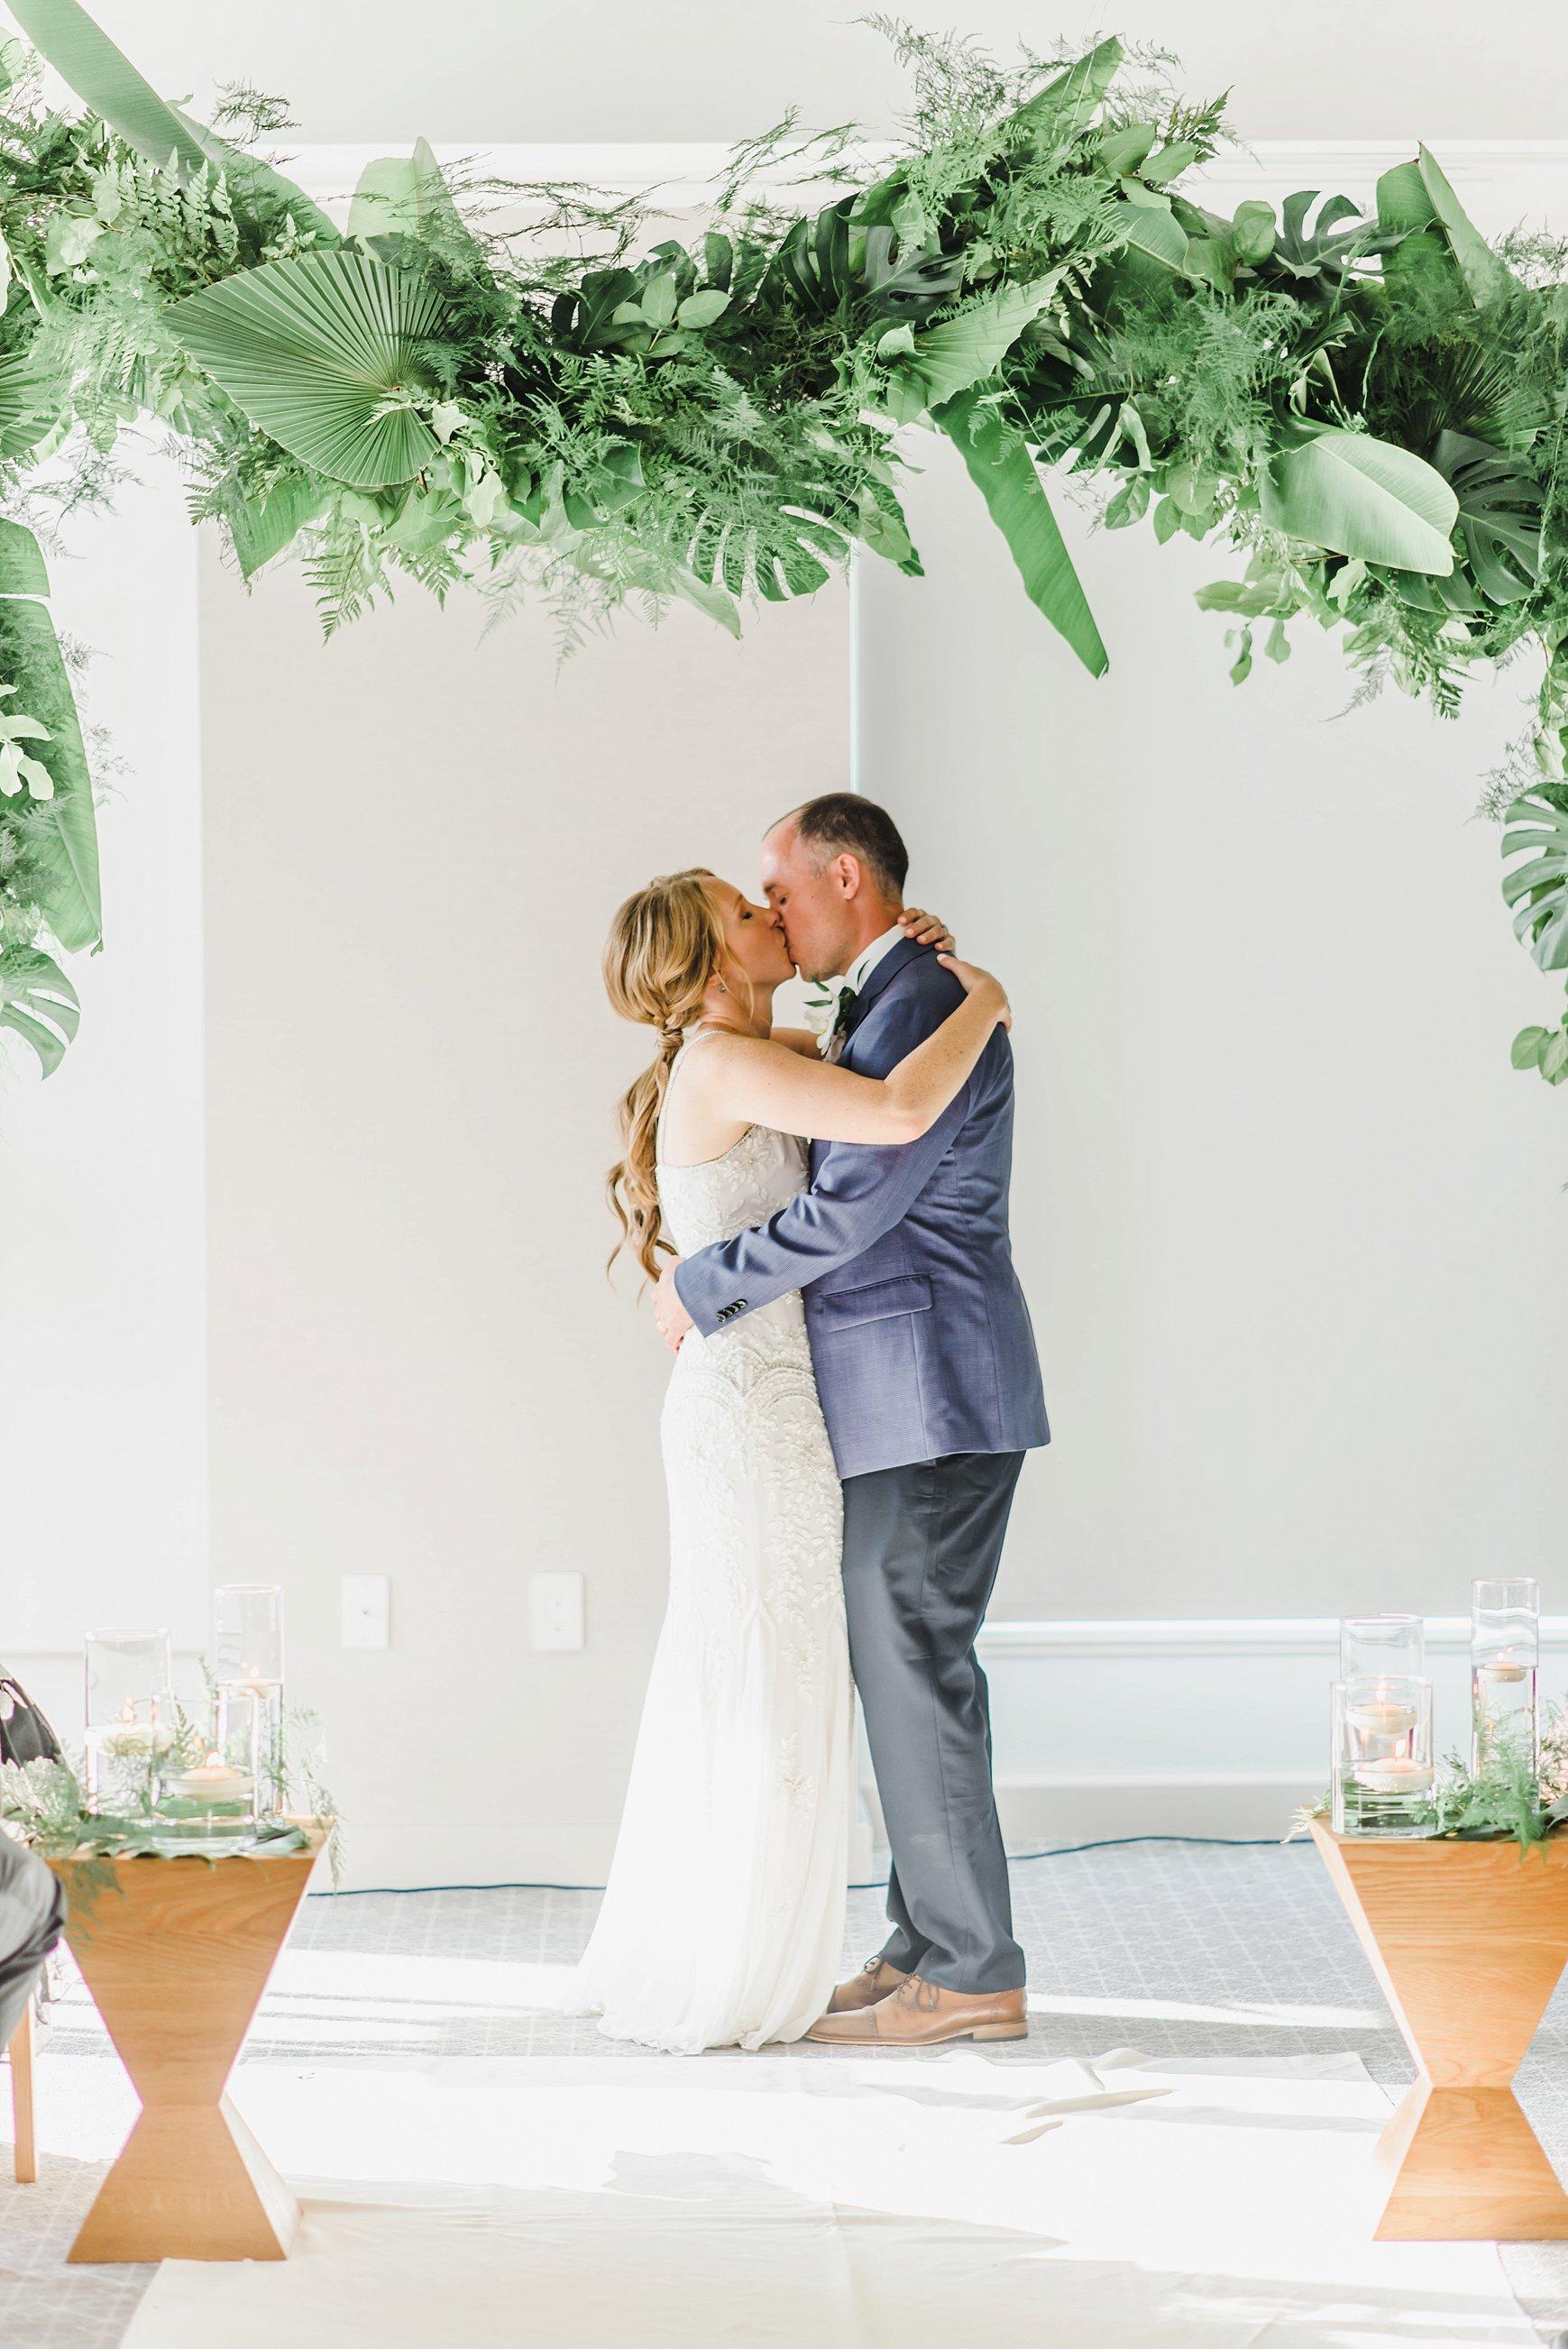 light airy indie fine art ottawa wedding photographer | Ali and Batoul Photography_0688.jpg